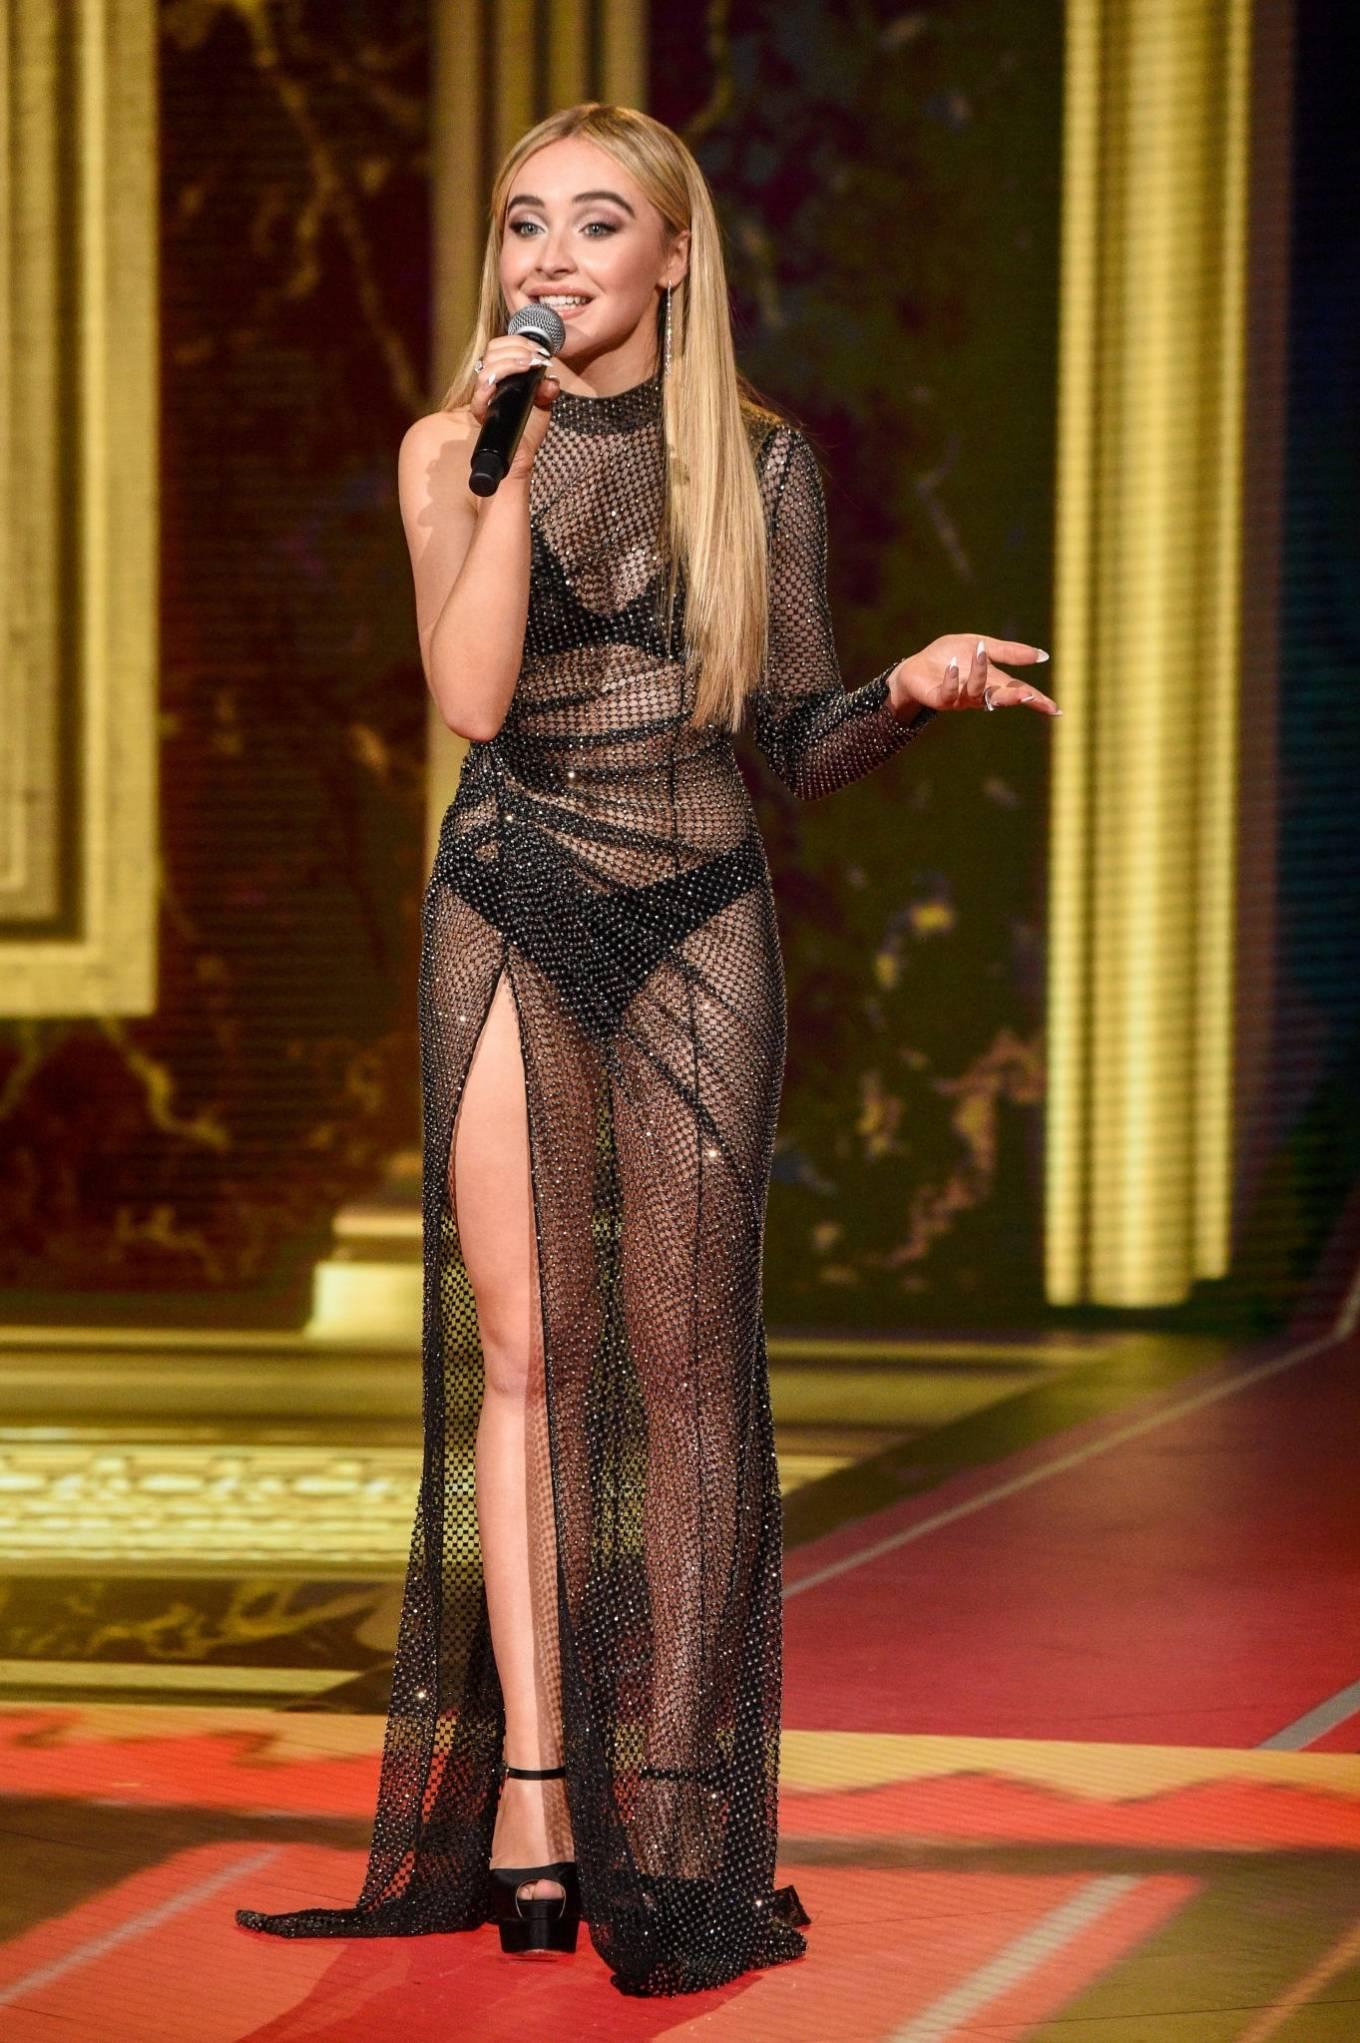 Sabrina Carpenter 2020 : Sabrina Carpenter – 2020 MTV Movie and TV Awards: GOAT in LA-18